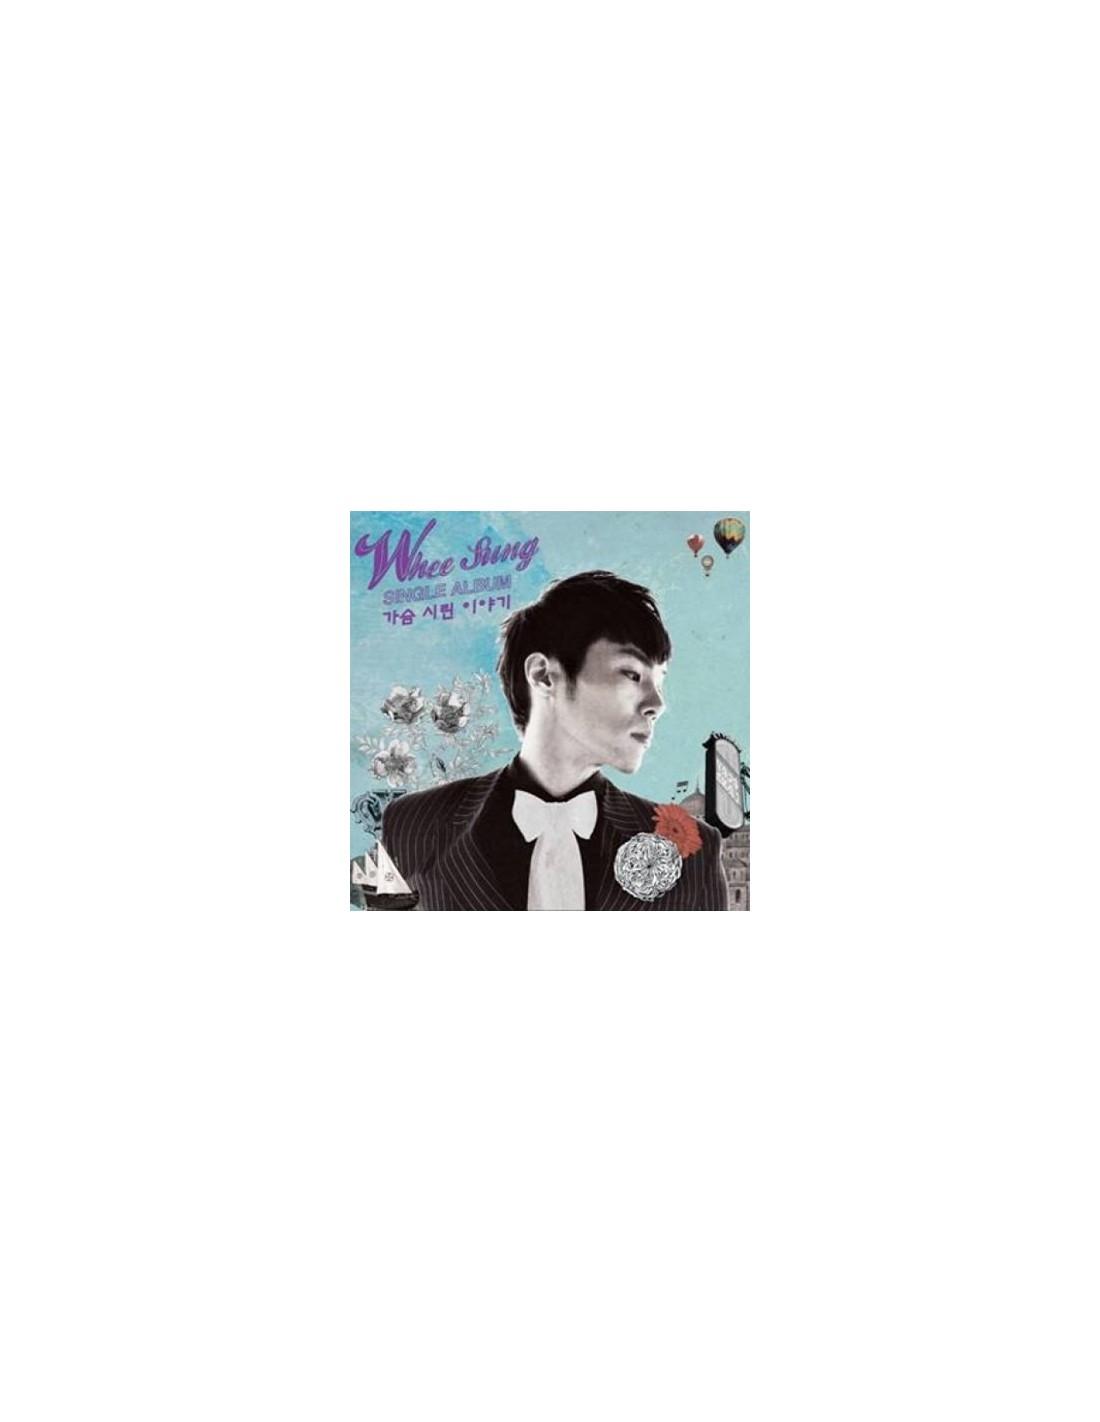 Wheesung Single Album - Heartsore Story